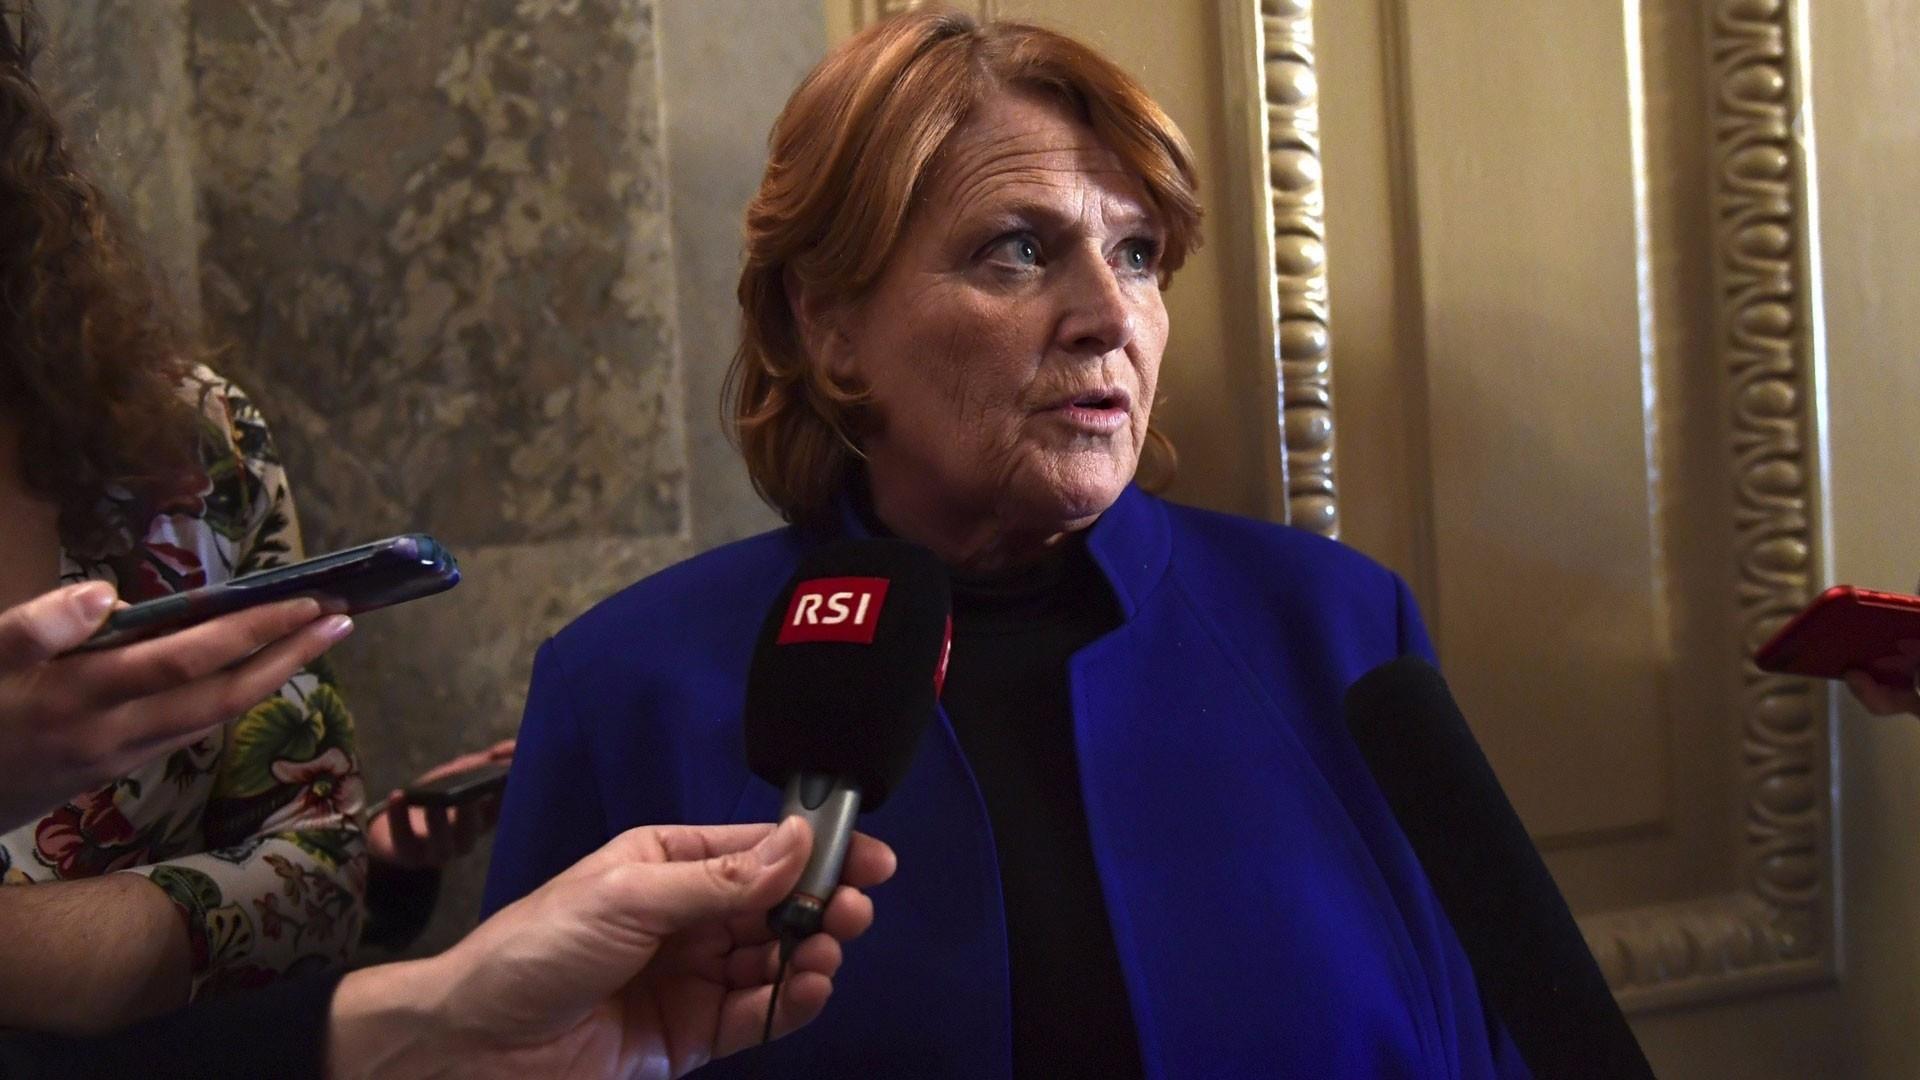 Red-state Democrat Heidi Heitkamp: I'm voting 'No' on Kavanaugh